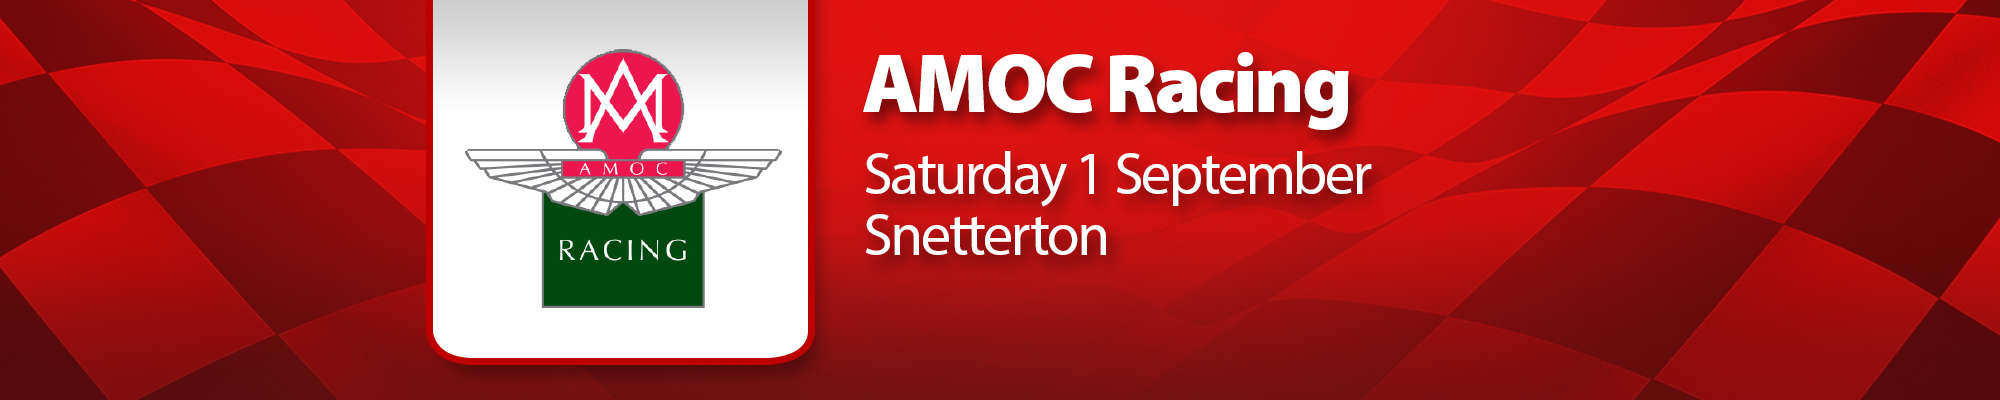 AMOC Racing Club Car Championships